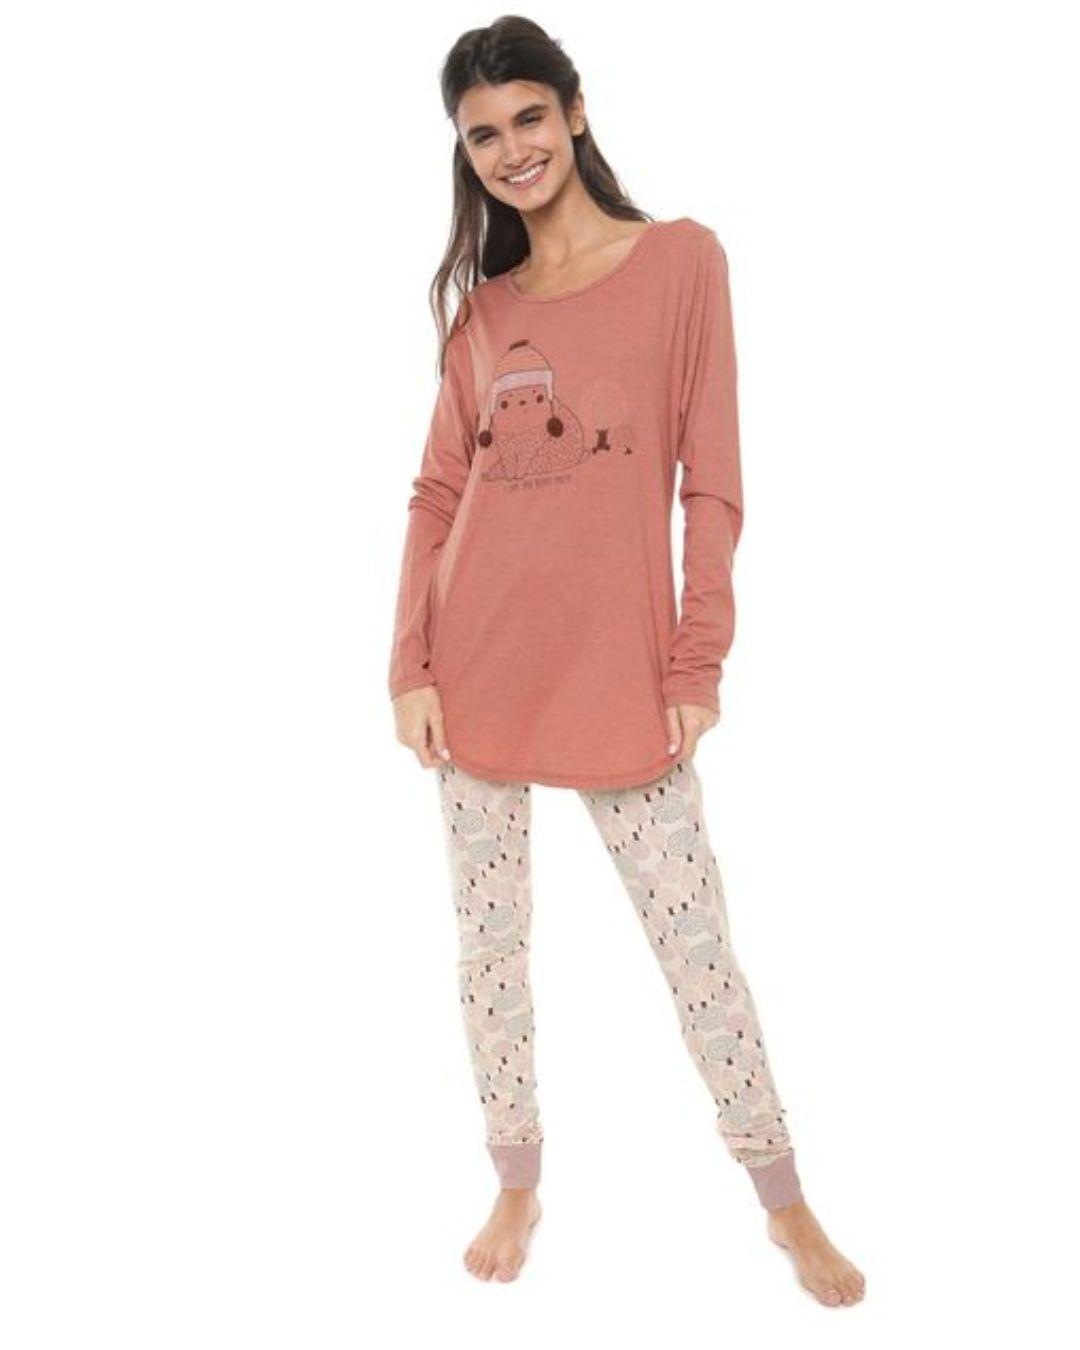 Pijama Manga Longa Rosa Candy Cor com Amor 10857